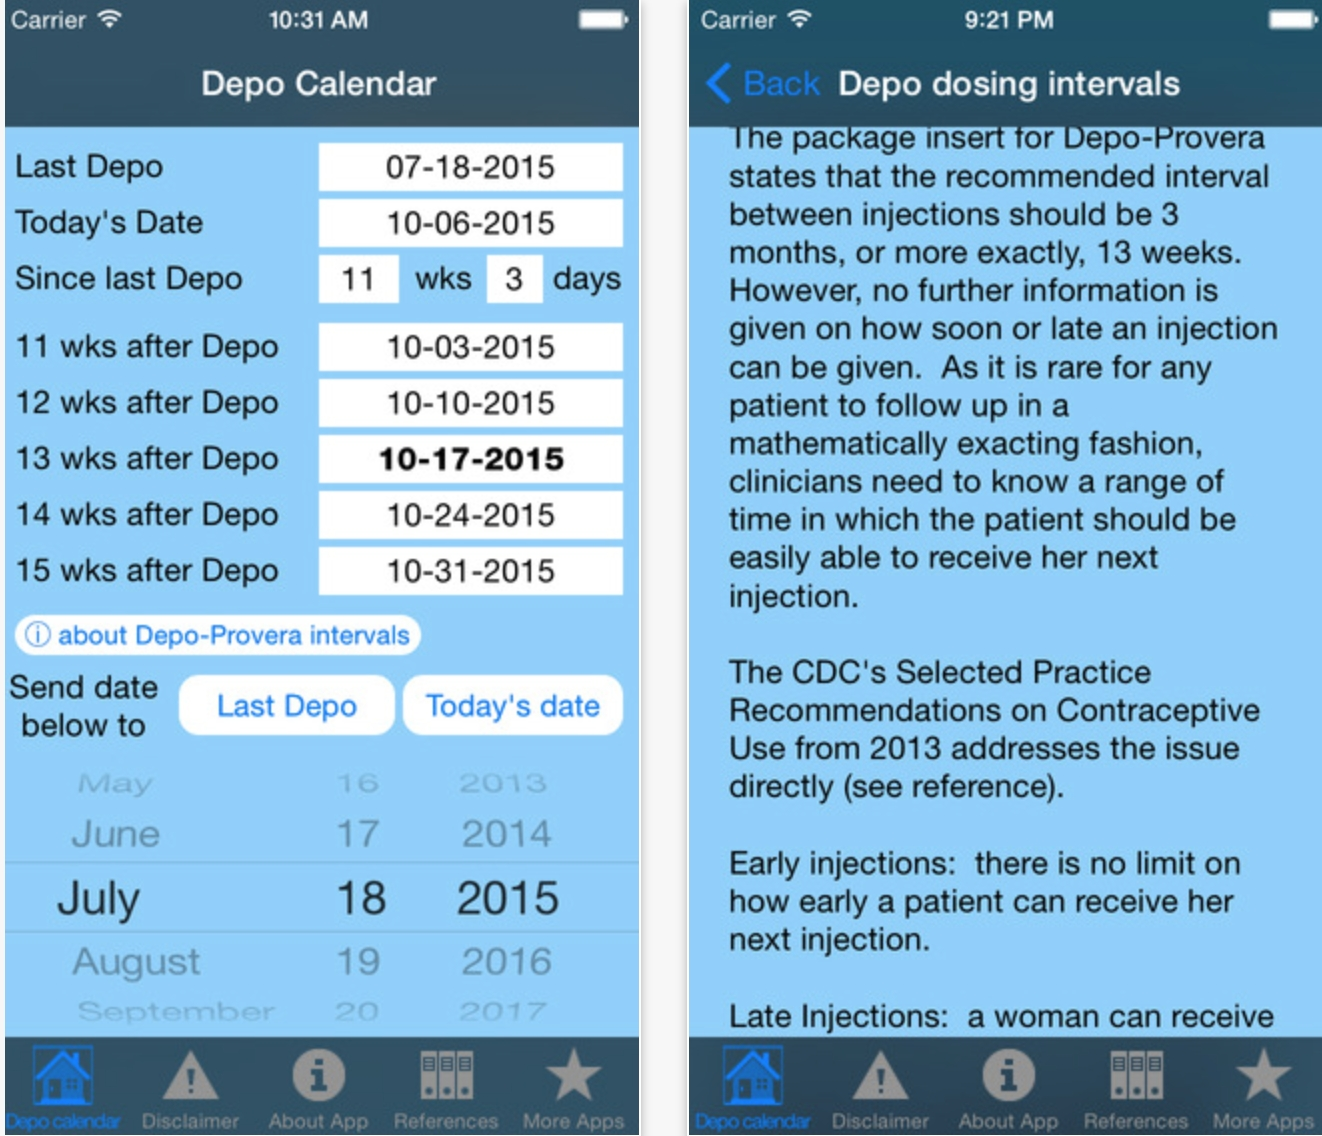 Depo Calendar App Could Significantly Improve Contraception  Depo-Provera Dosing Calendar